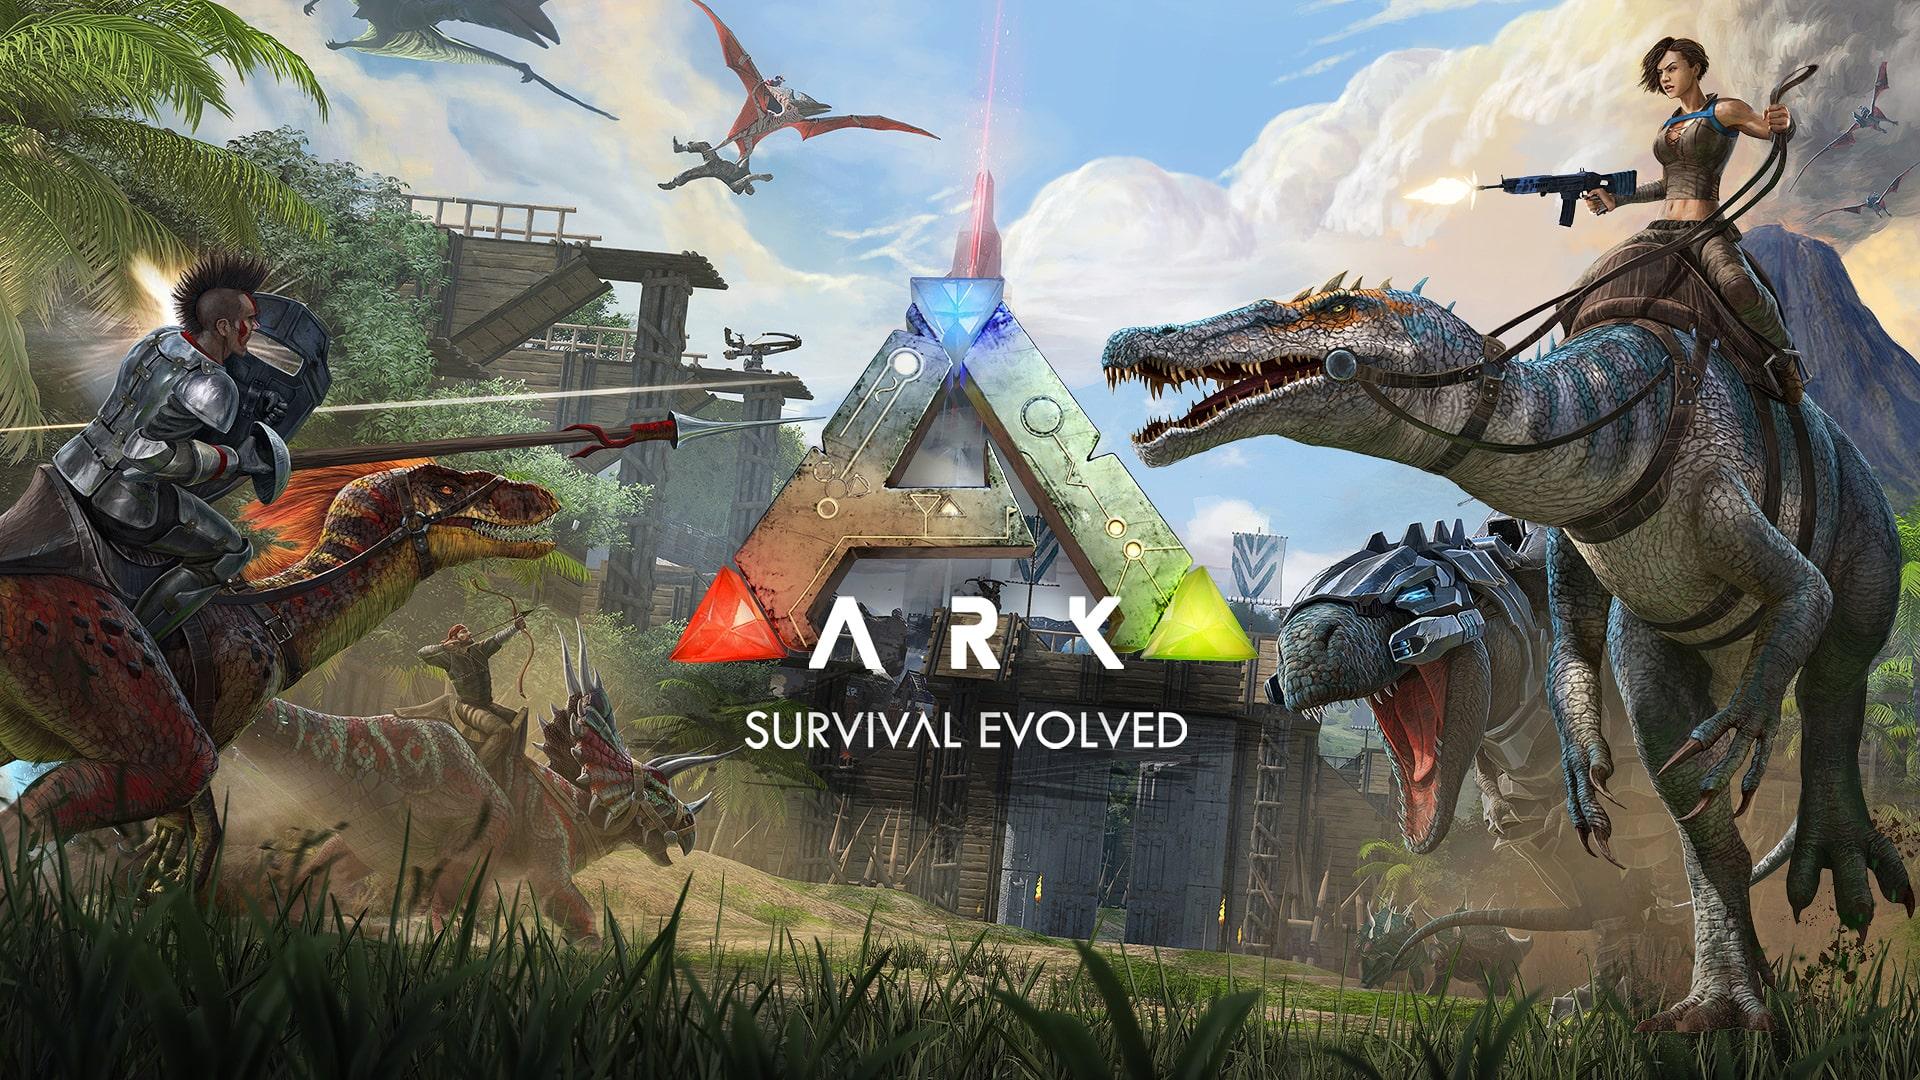 ARK เกมแนวเอาชีวิตรอด ไดโนเสาร์